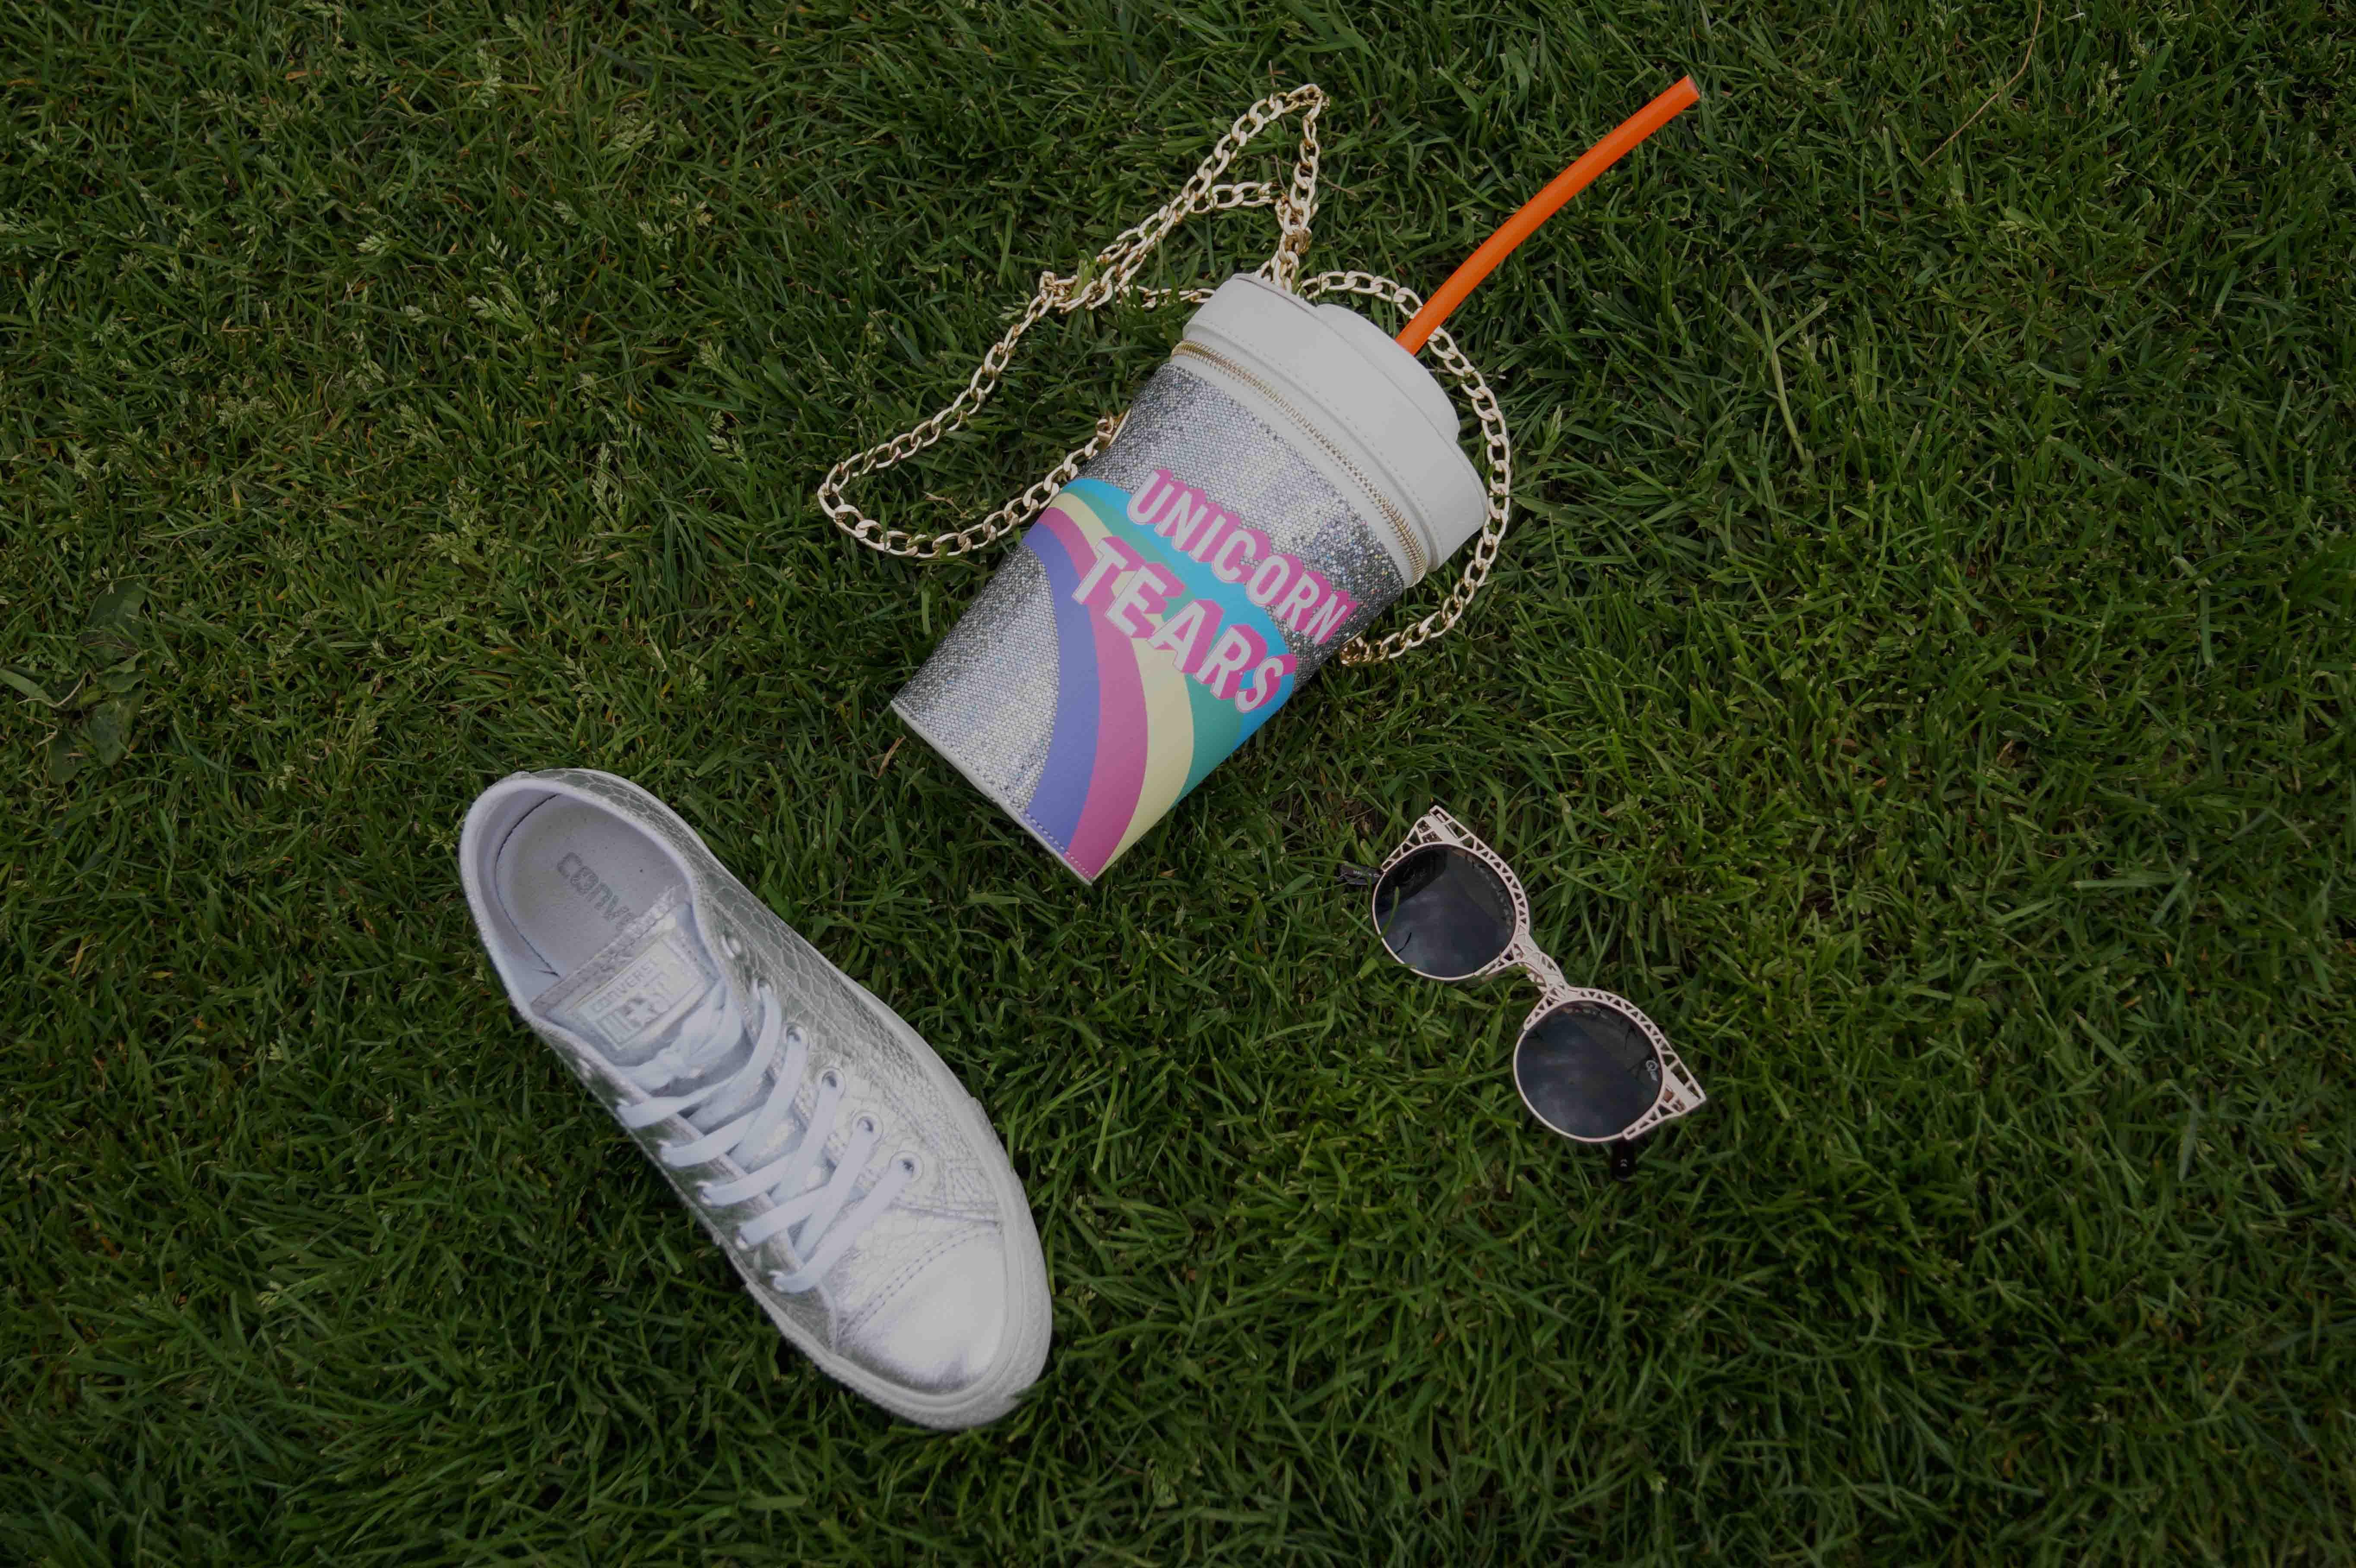 Bag at You - Fashion Blog - Festival tas - Party Bag - Milkshake - Sunglasses - Converse - Unicorn schoudertas